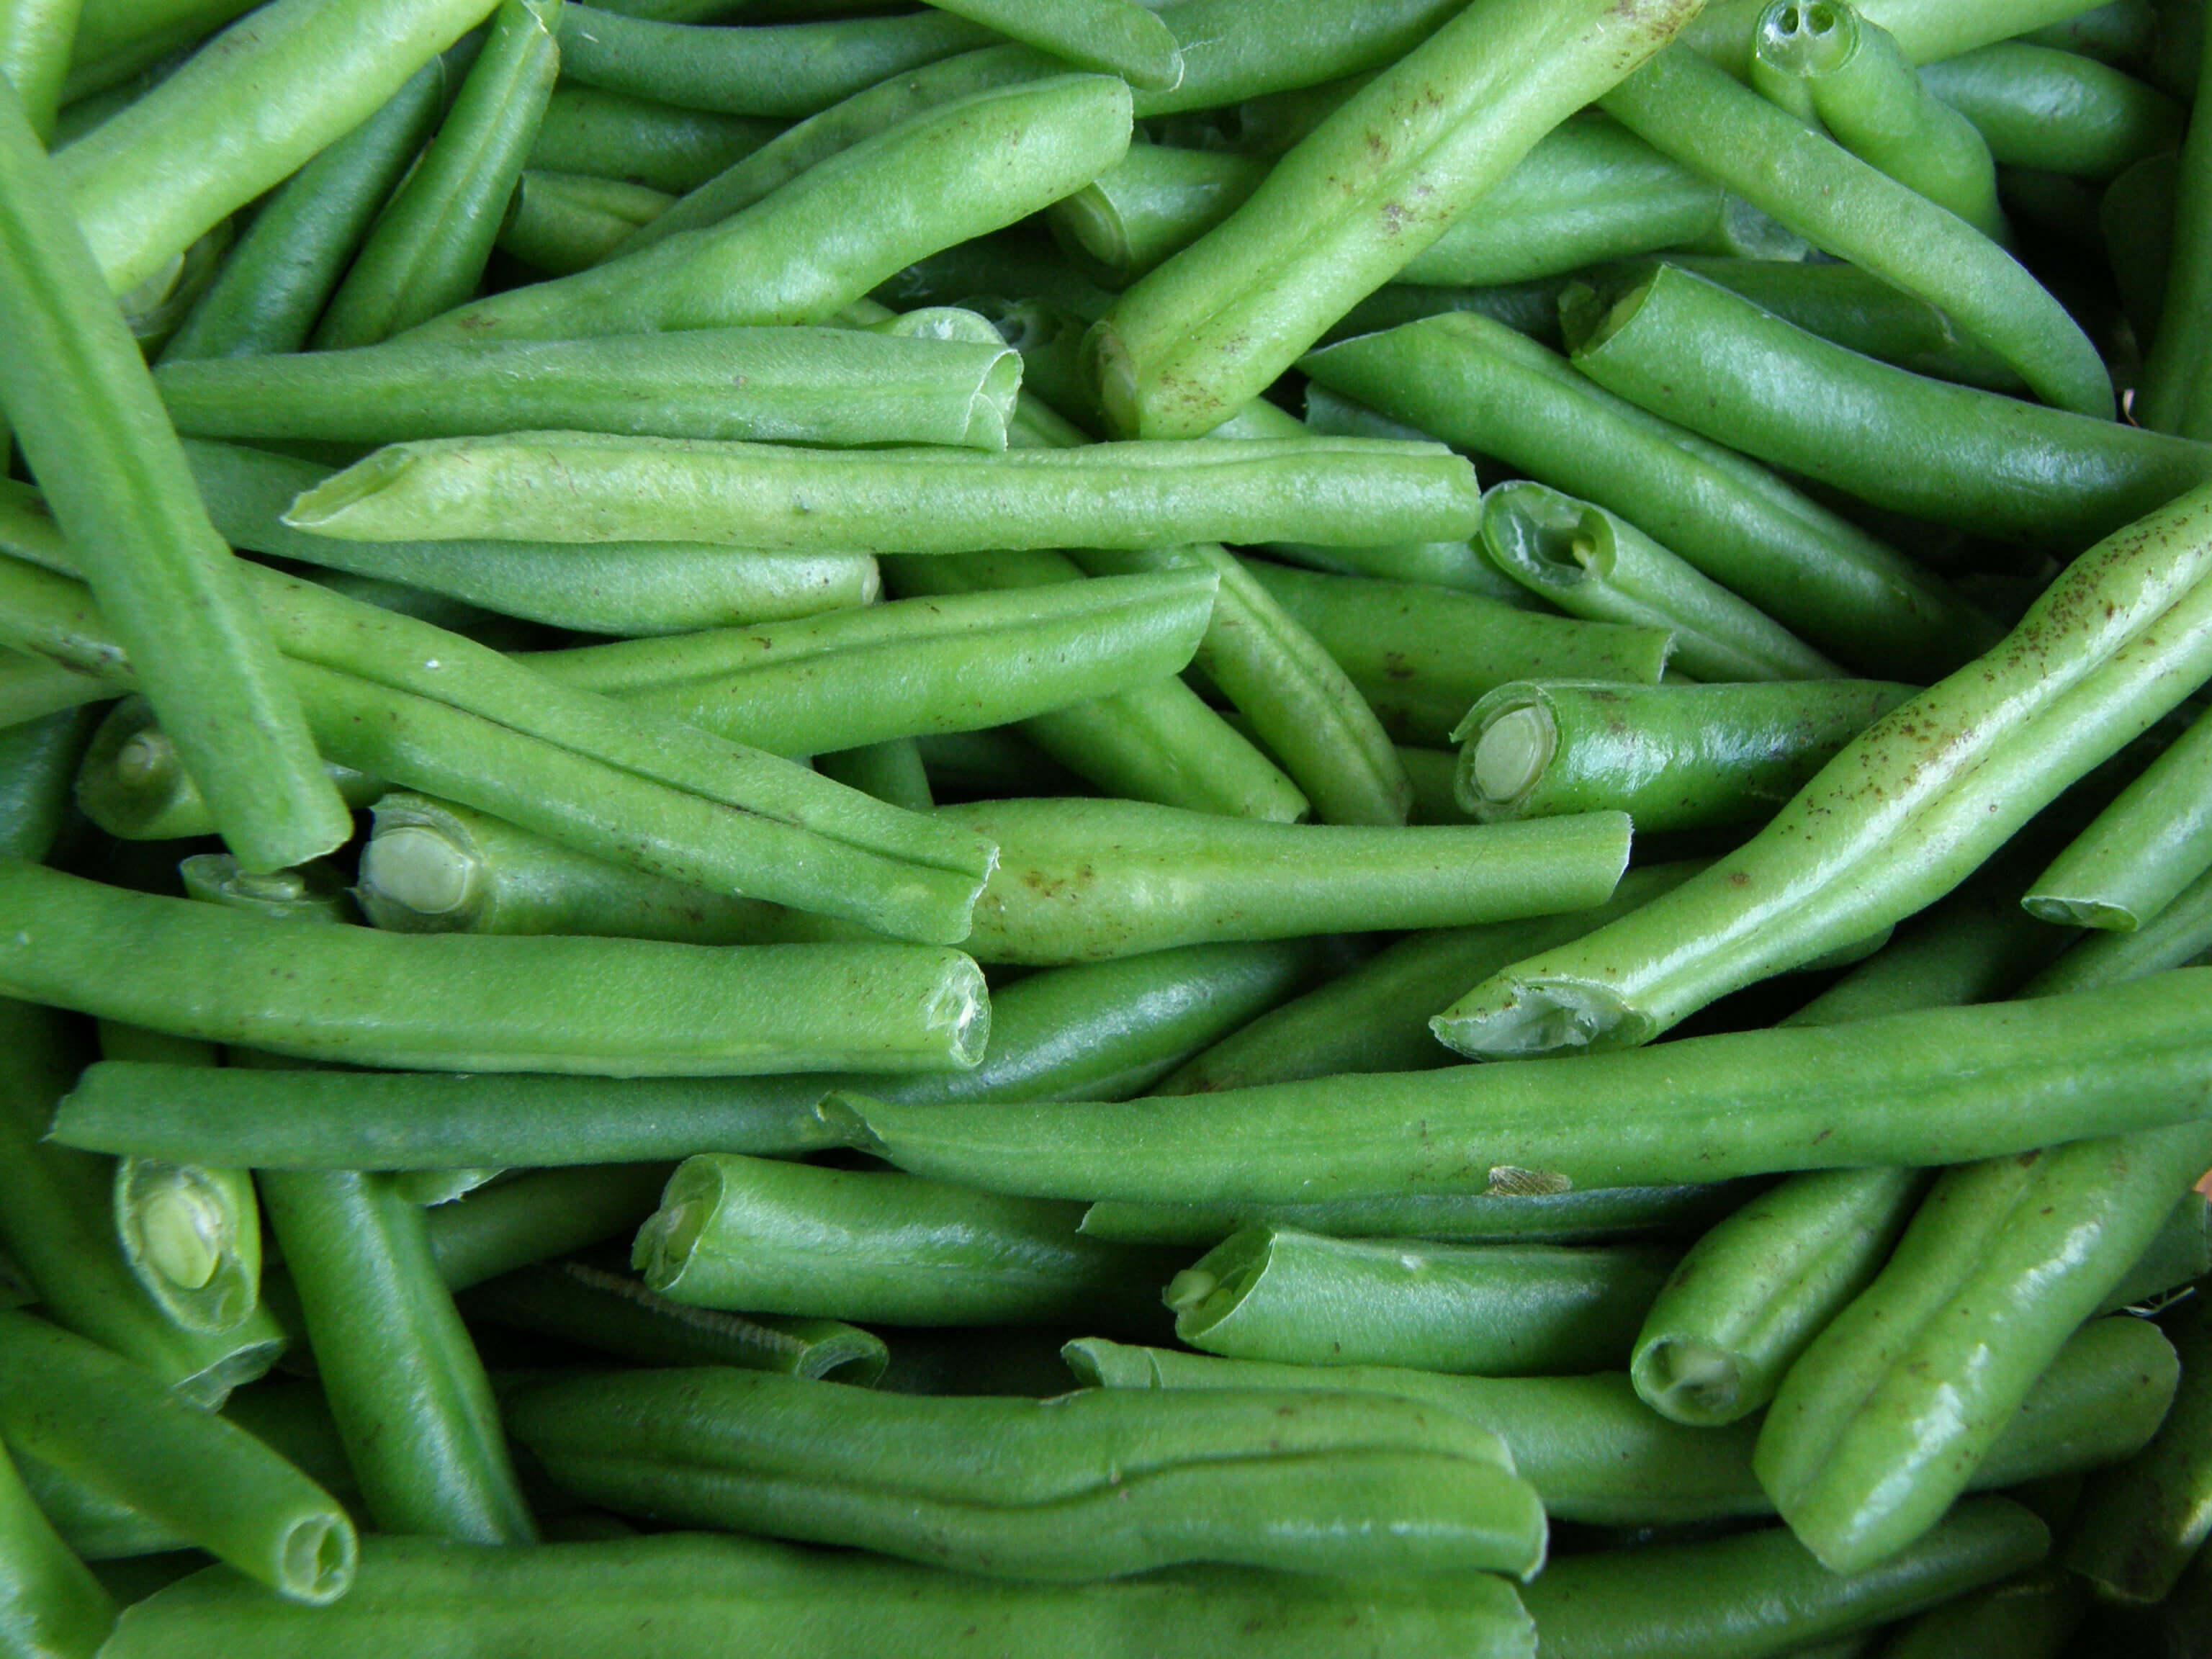 Seasonal Veggies: What to Buy Now